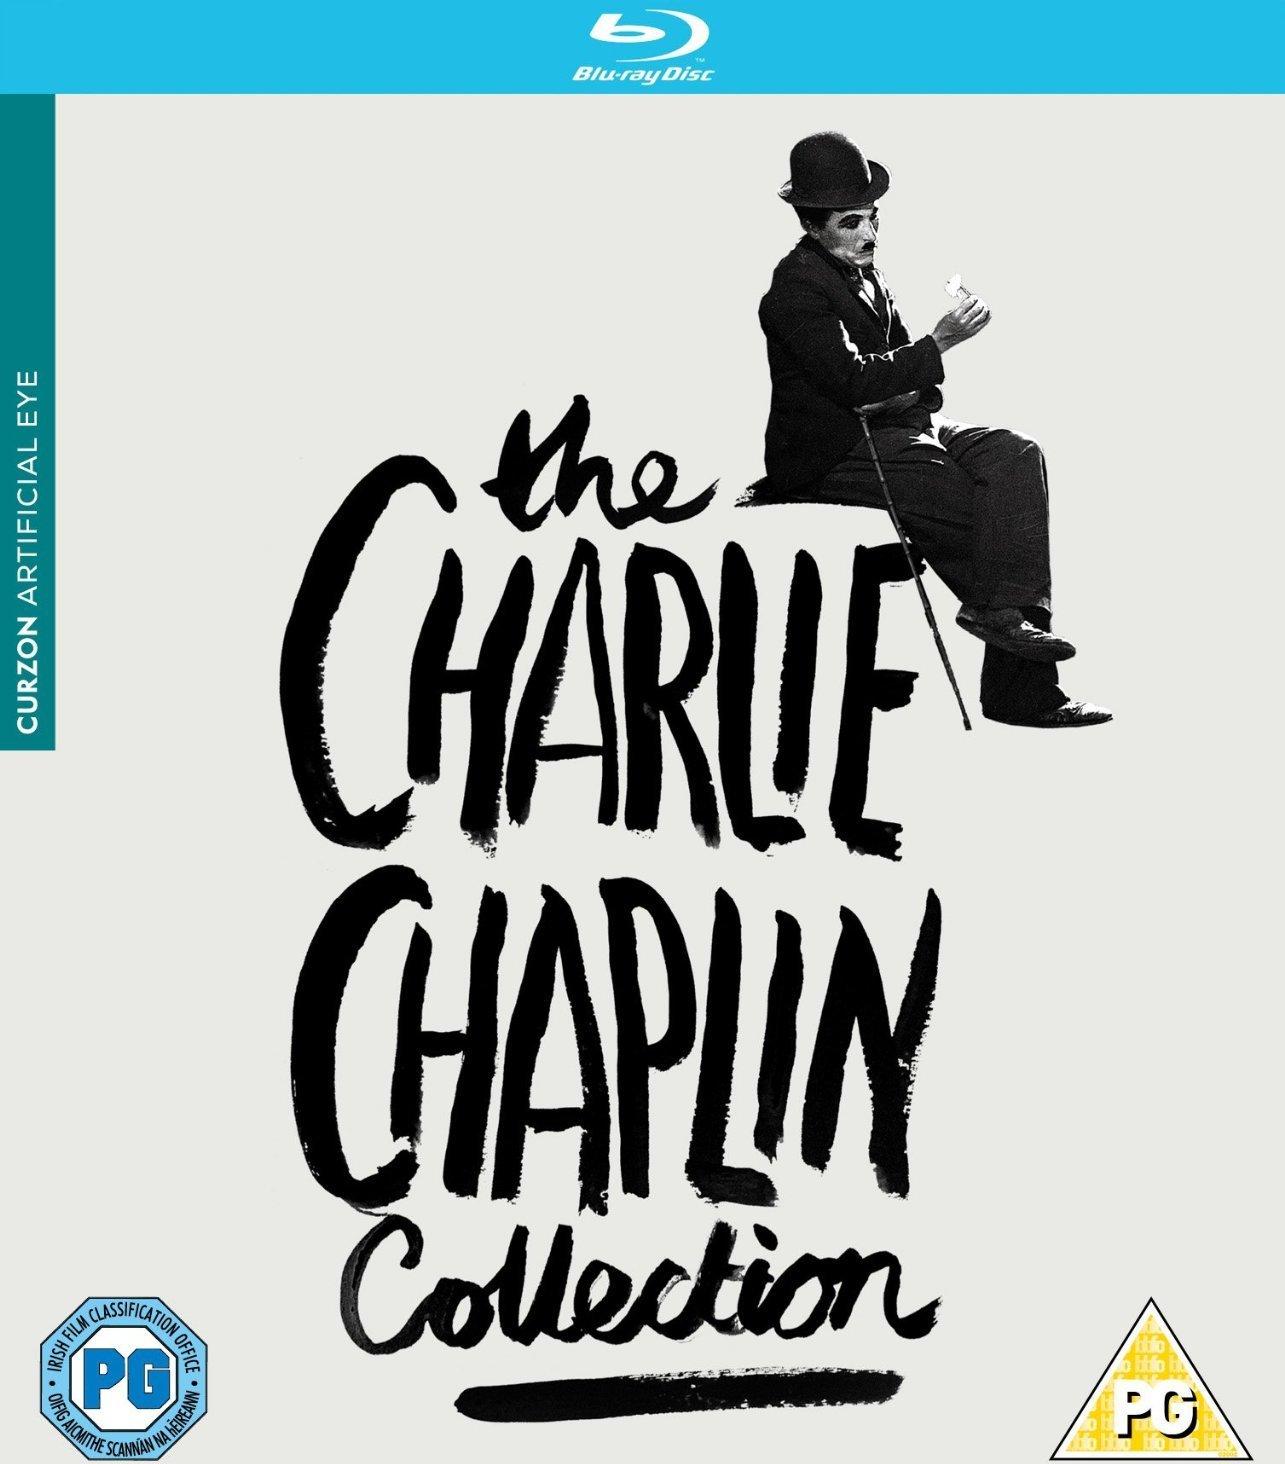 The Charlie Chaplin Collection UK Artificial Eye Blu-ray box set